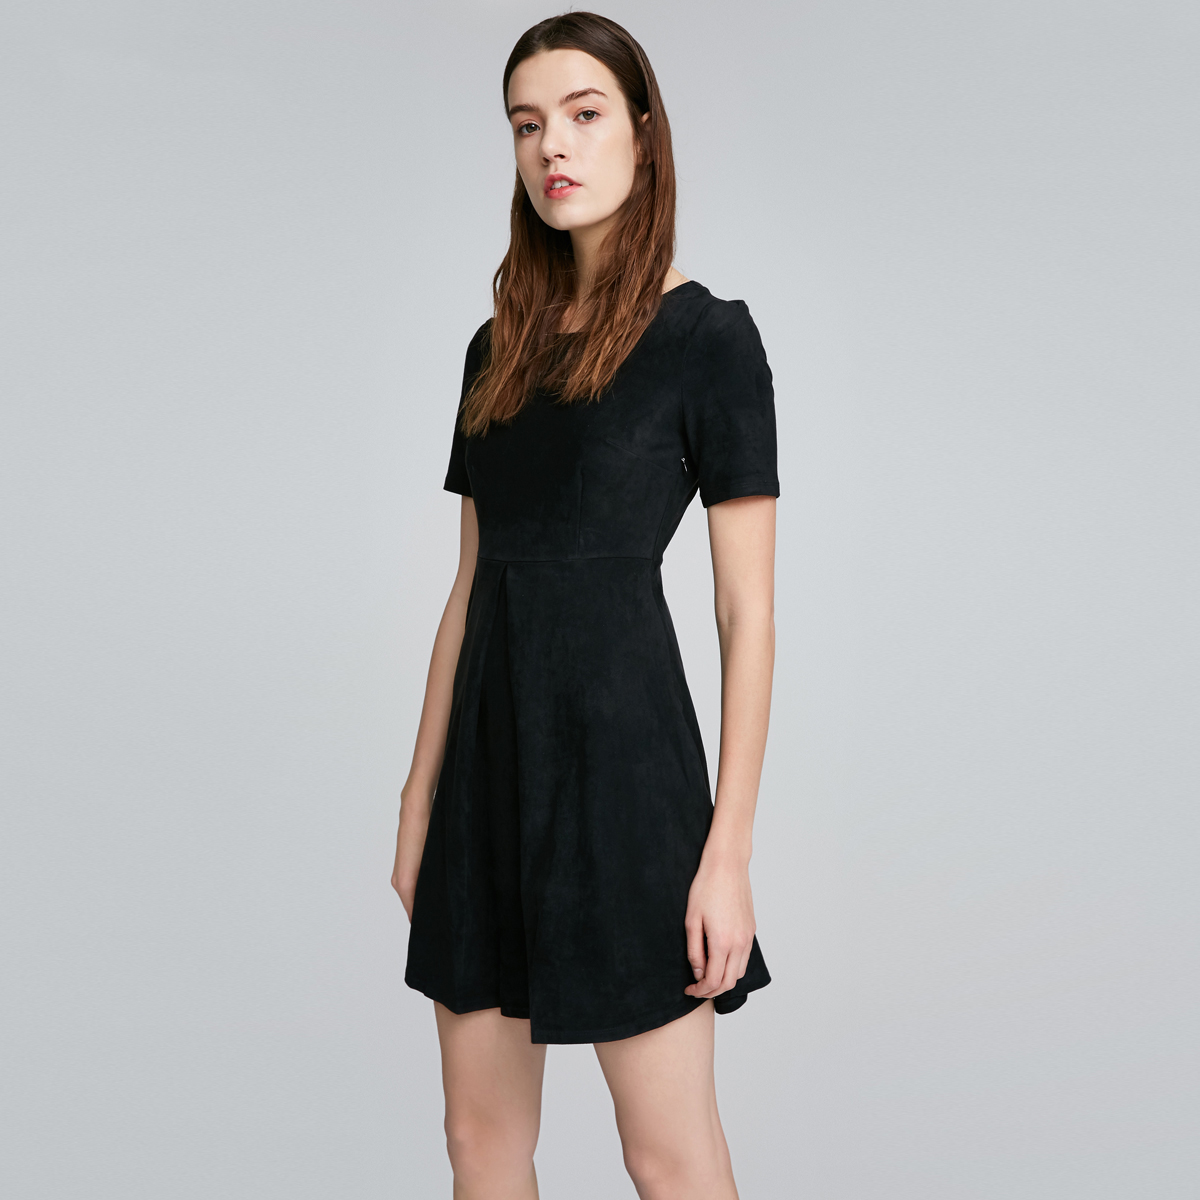 ONLY秋季新品修身捏褶设计圆领纯色短袖连衣裙女-116361517